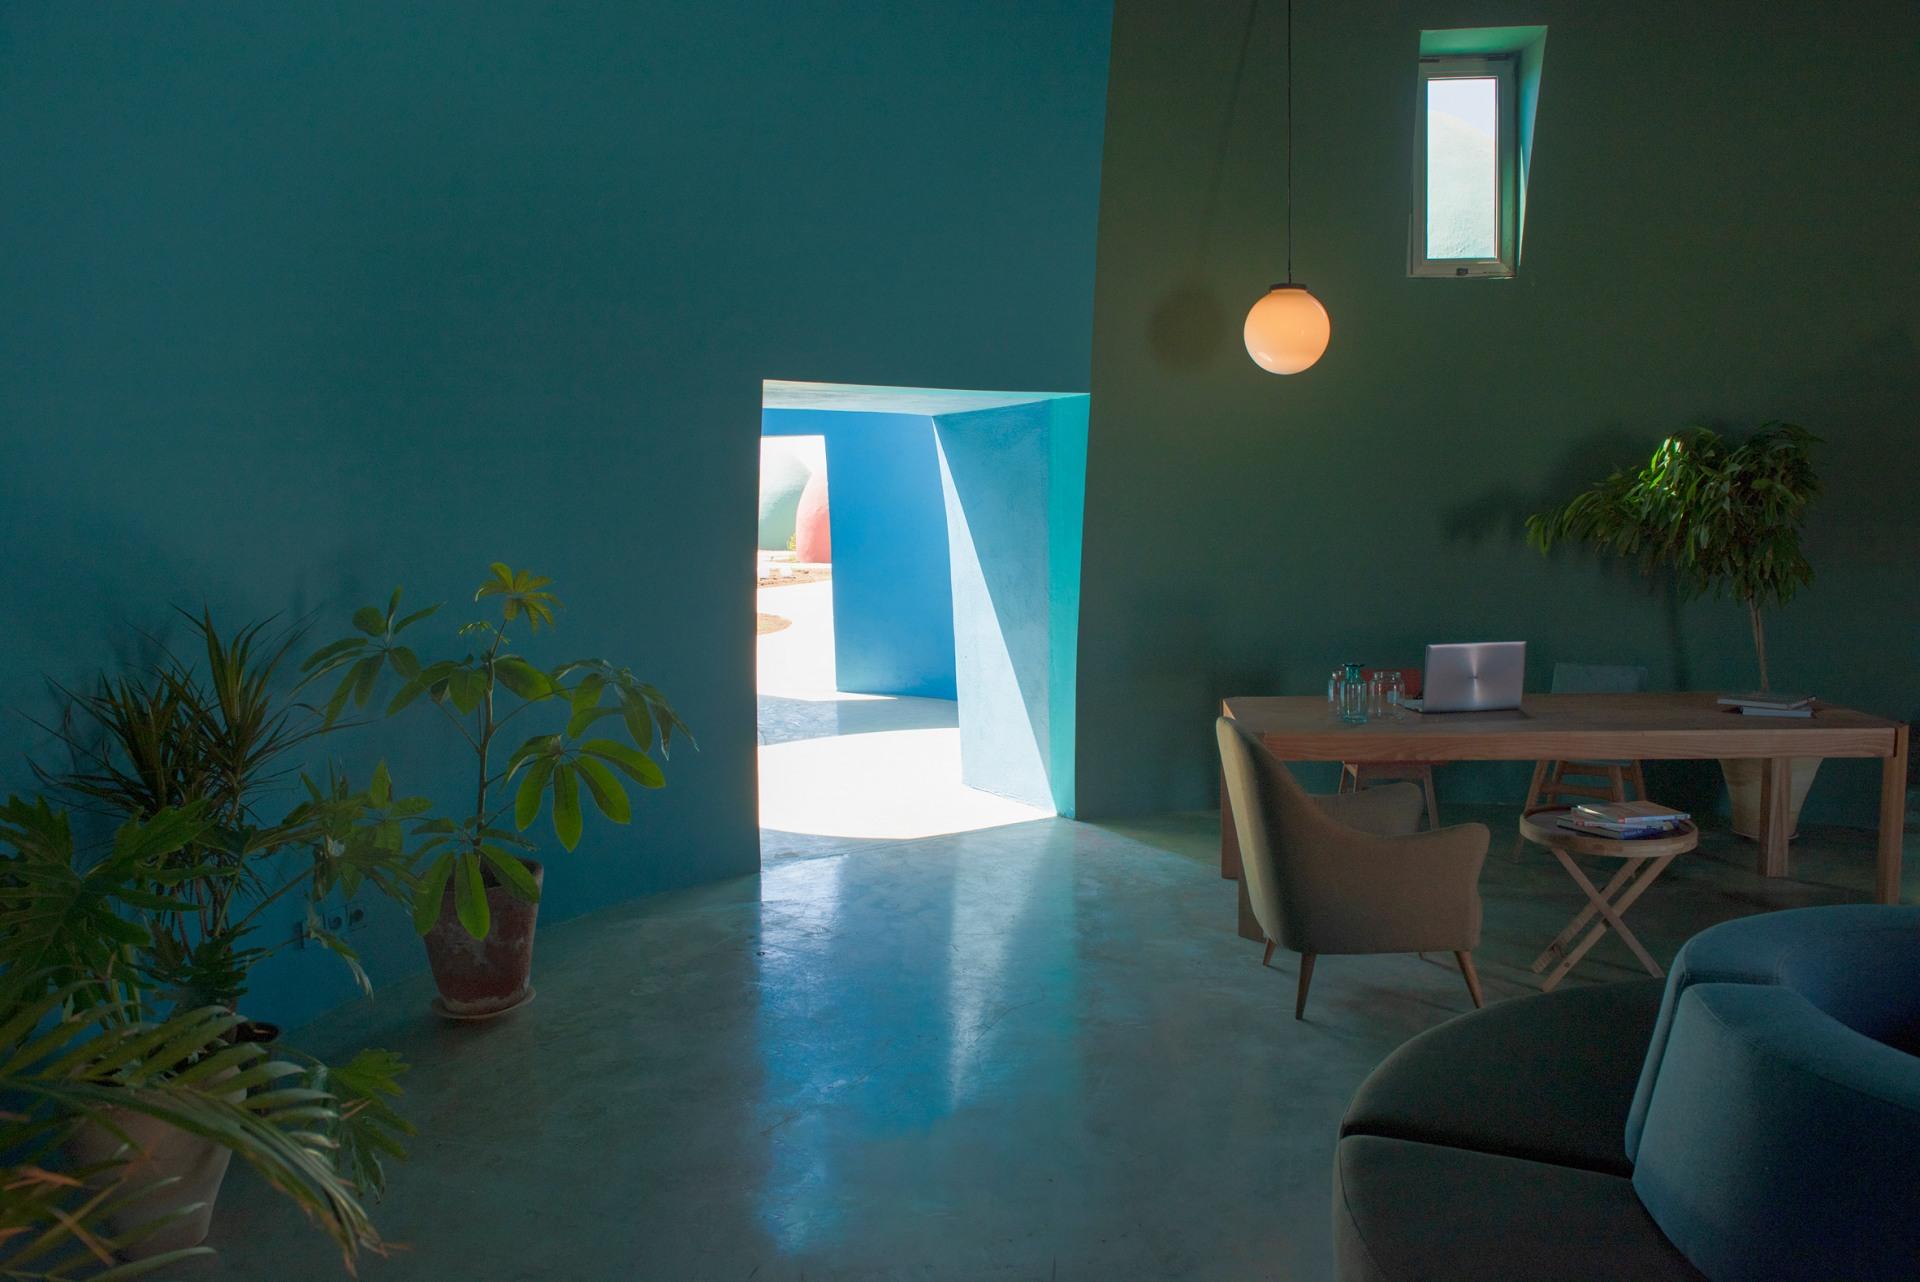 zav_architects_iran_hormuz_island_designalive-17